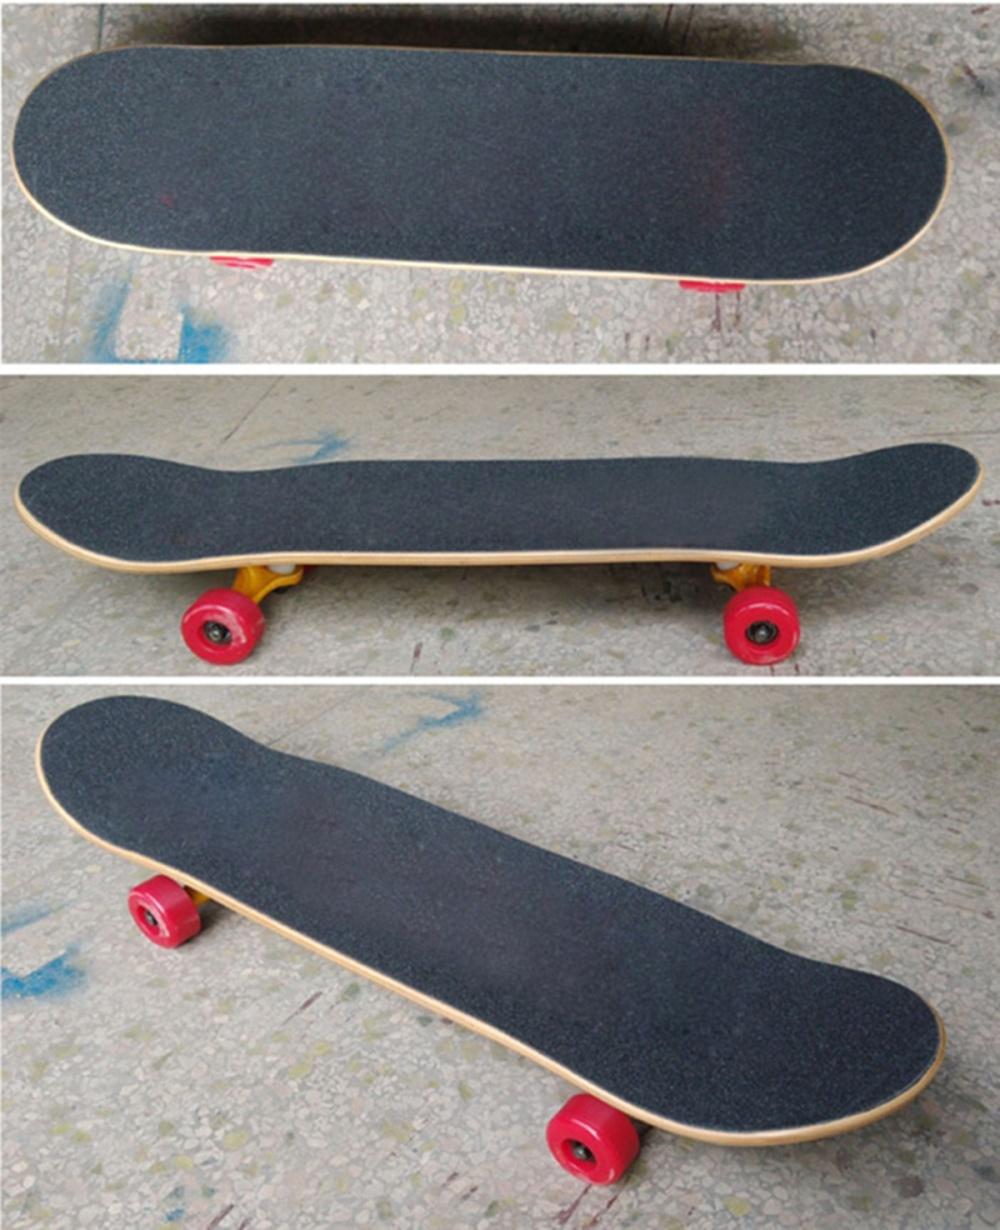 Pita Kertas Berlubang The Holes Pegangan Laju Skateboard Berseluncur Pasir Skuter Stiker 81 .